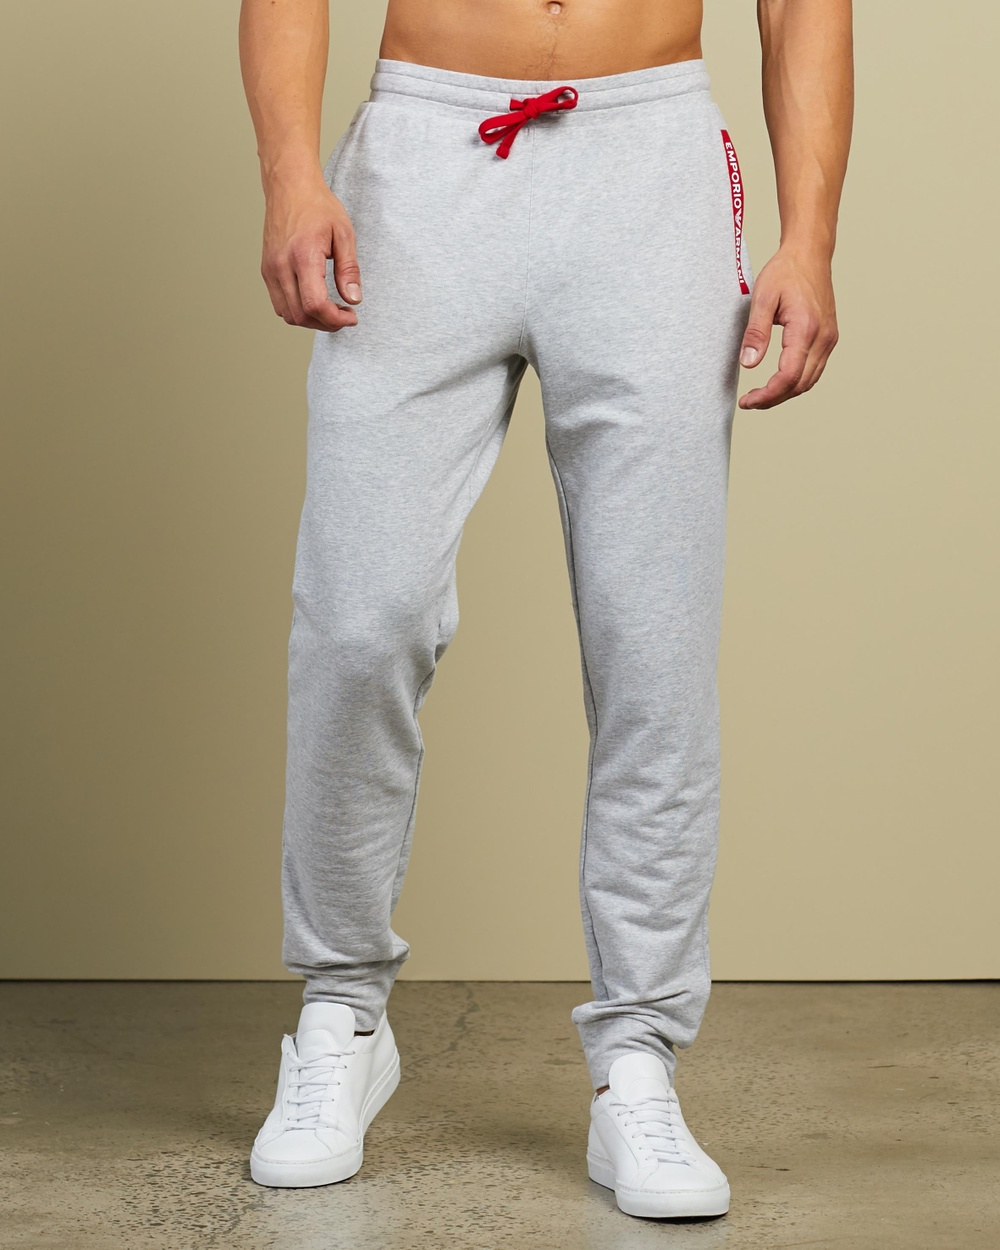 Emporio Armani Underwear Trousers Sleepwear Grey